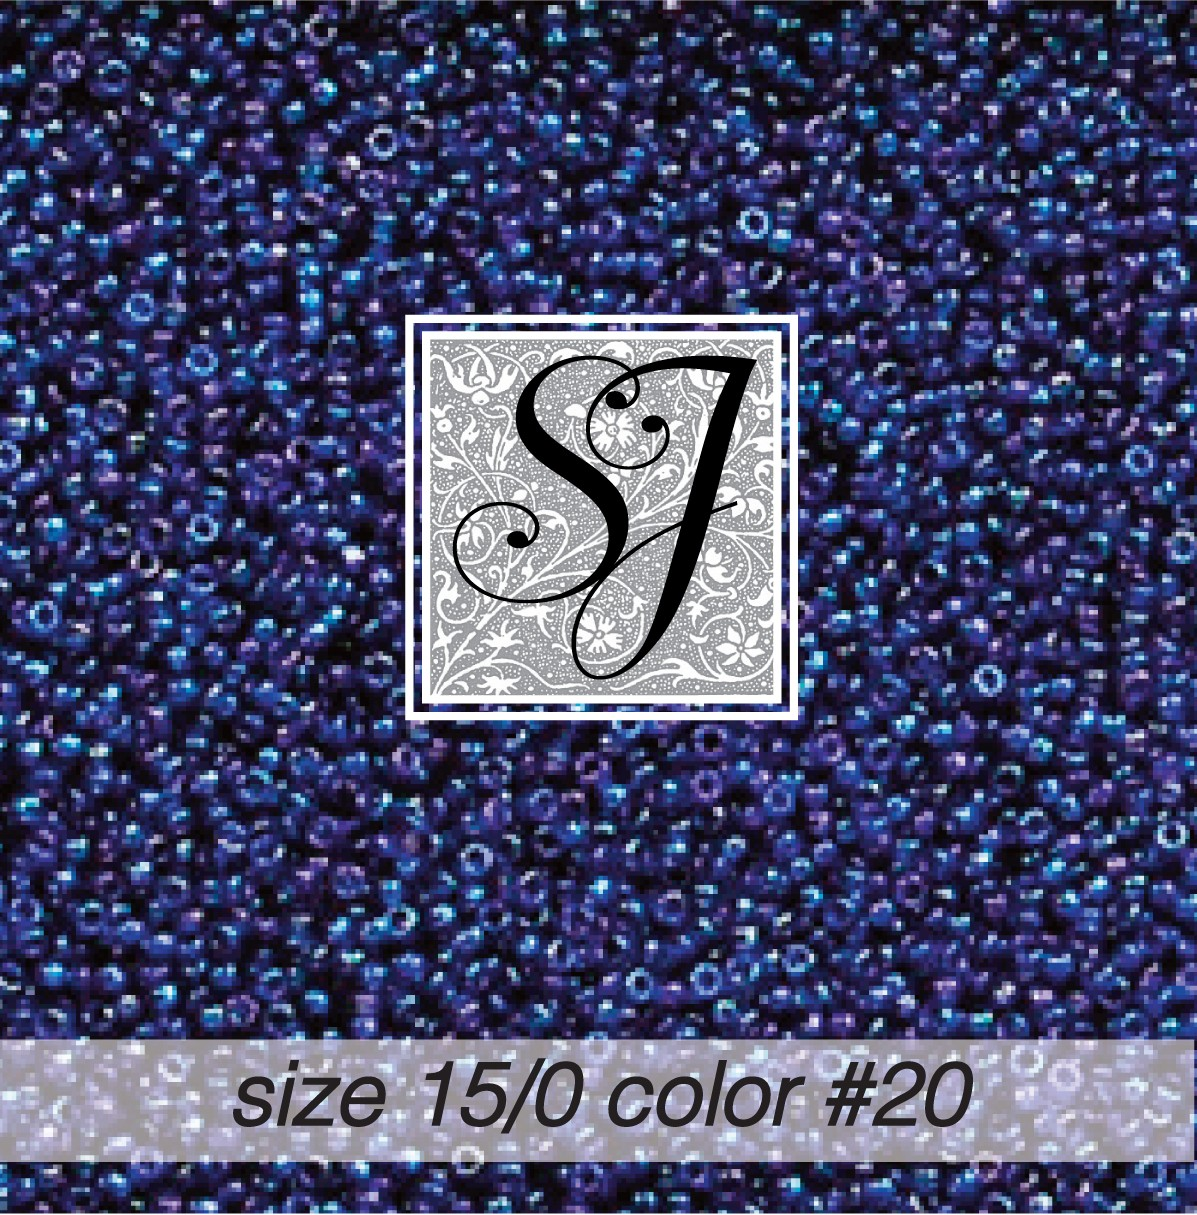 20 Dark Blue Irridescent 15/0 Seed Bead